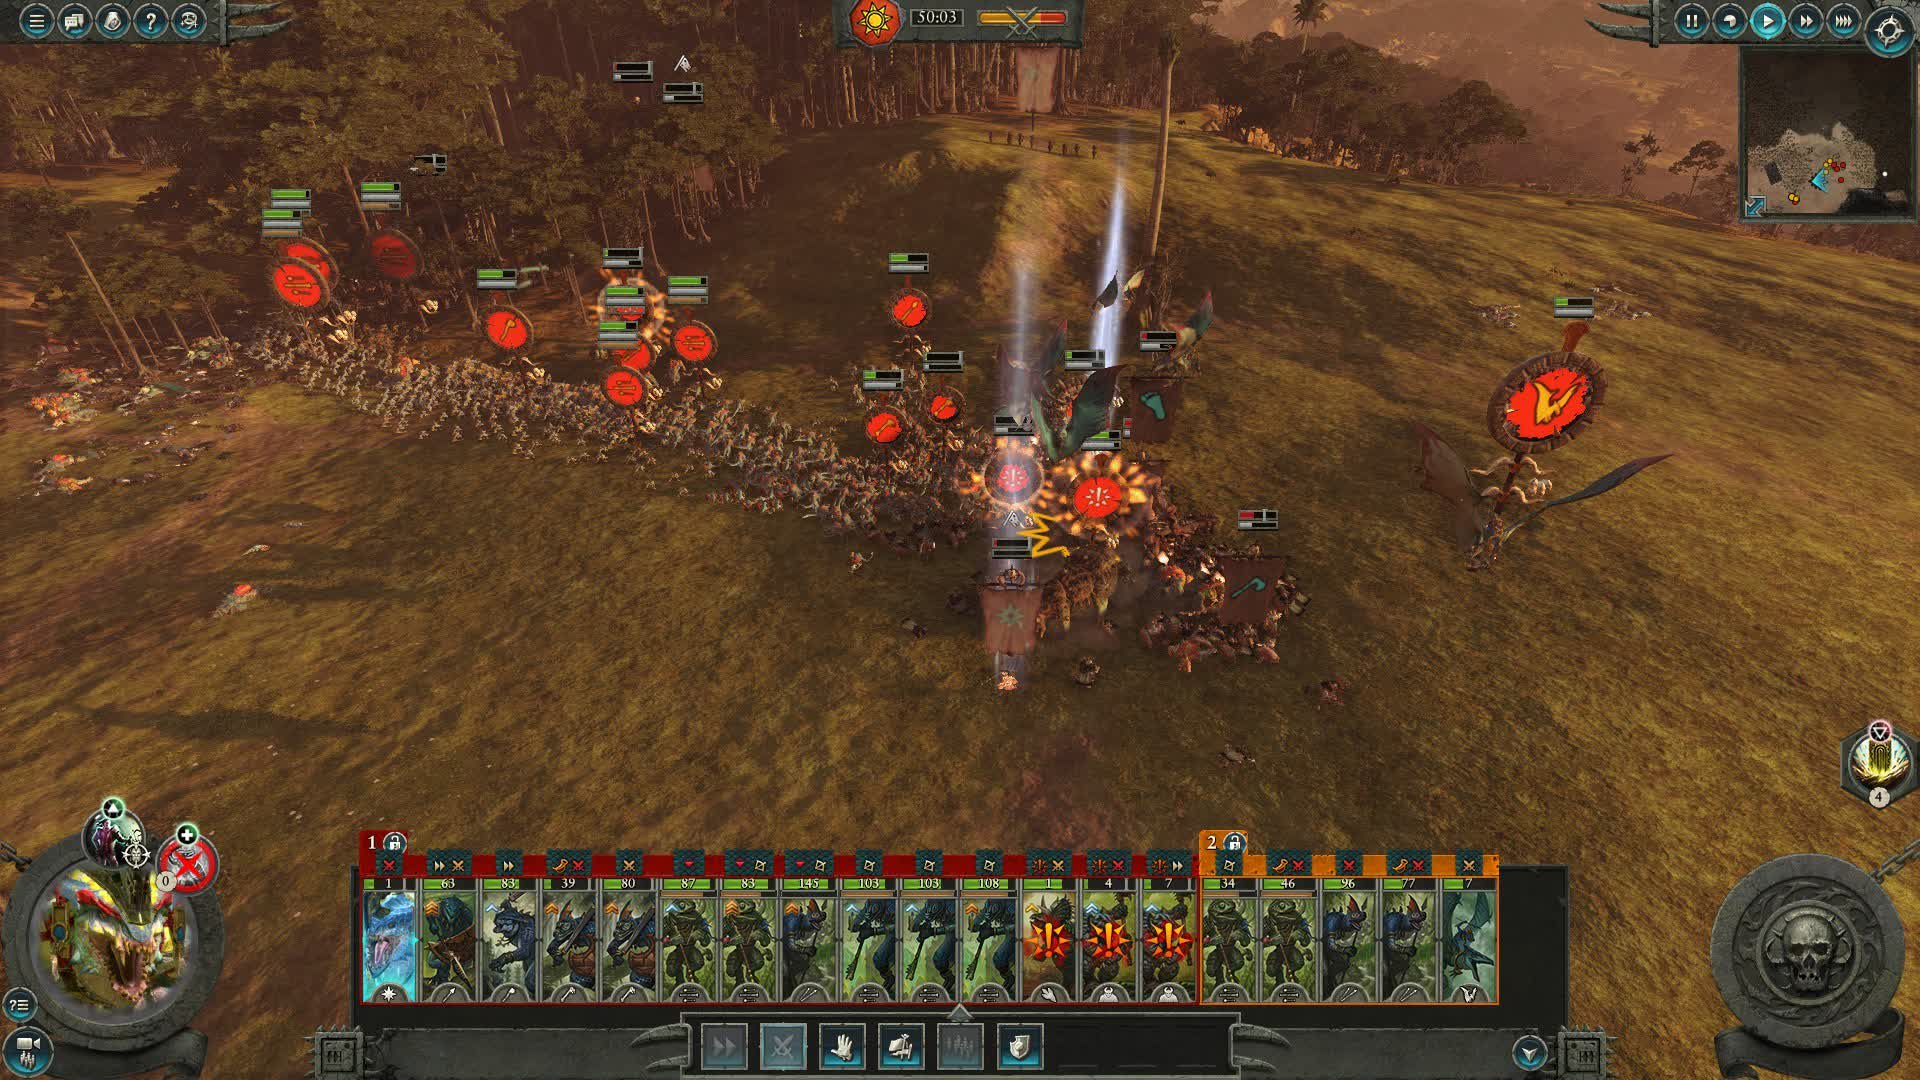 Total War: Warhammer 2 Reviews and Ratings - TechSpot